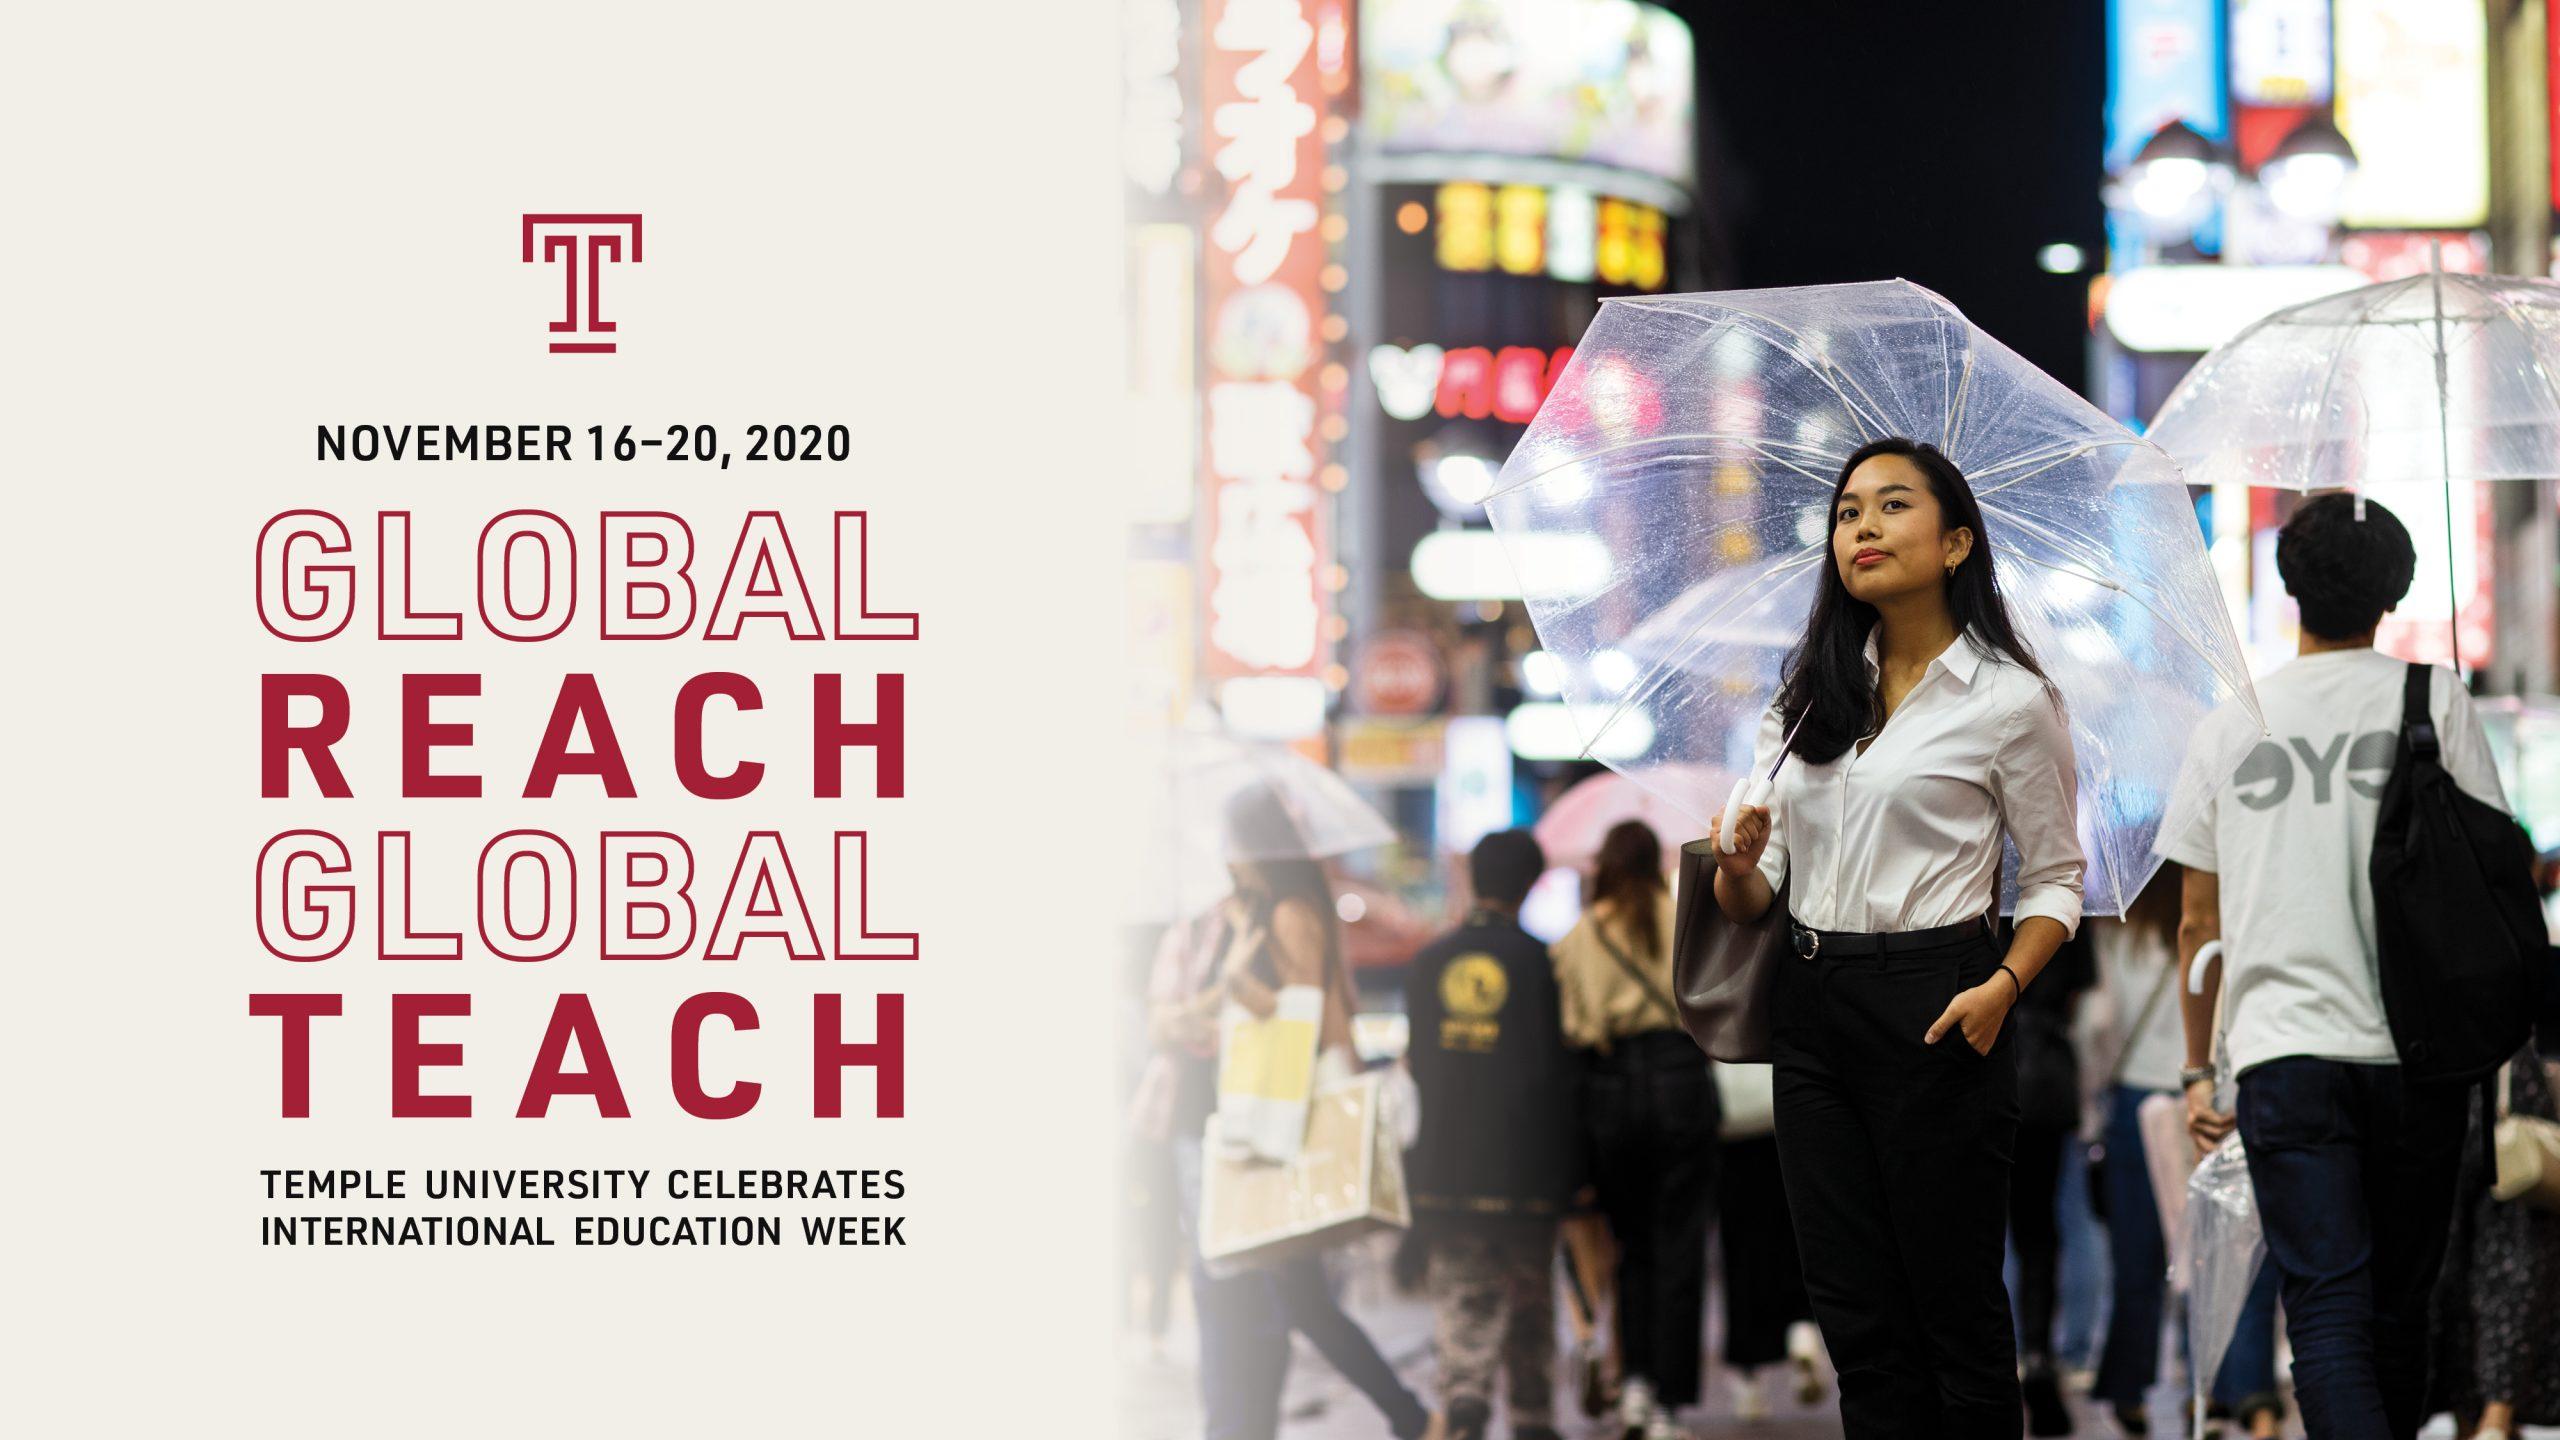 Temple University: Global Reach, Global Teach. International Education Week 2020